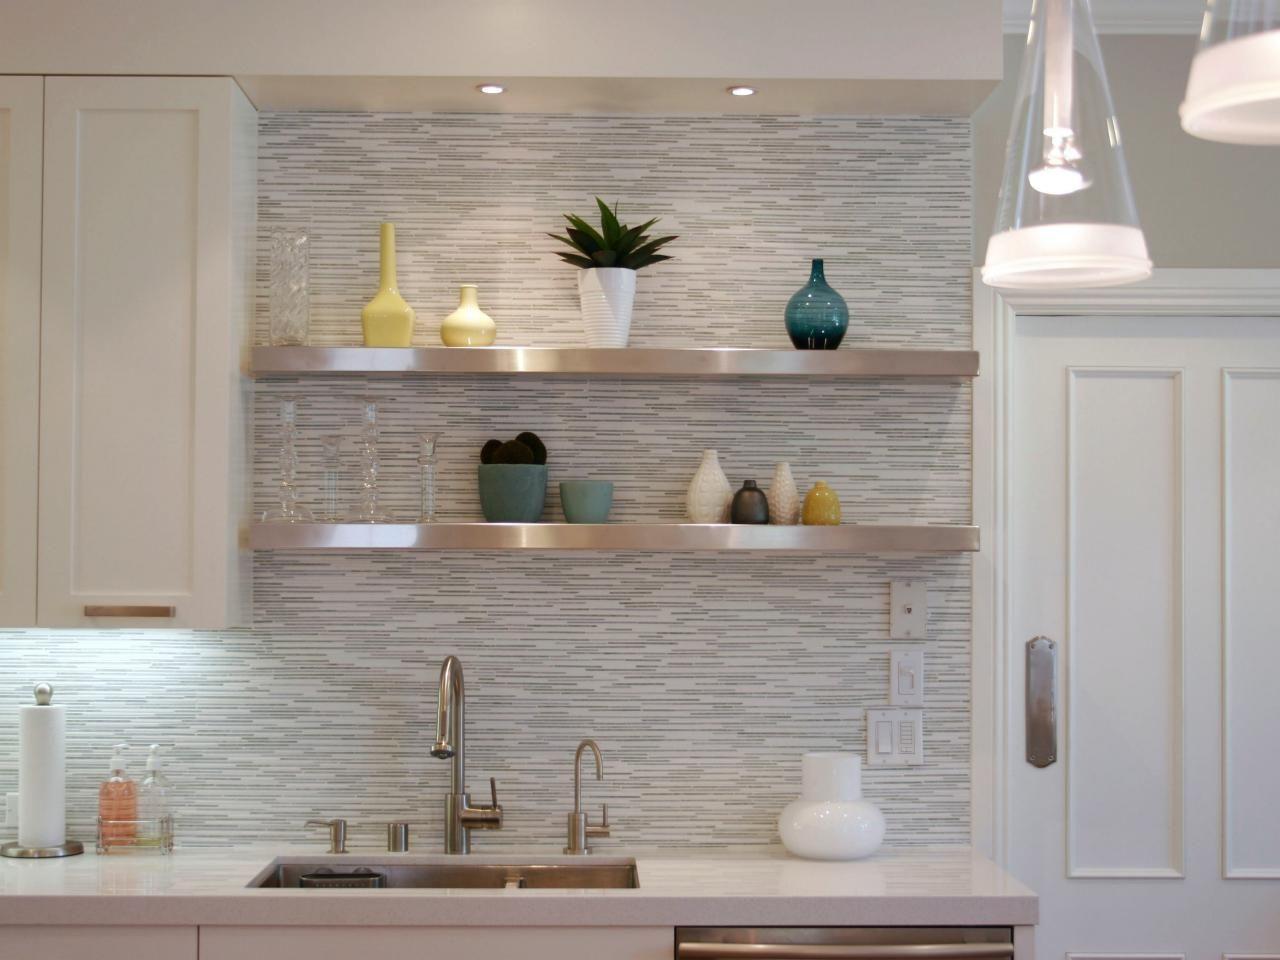 Pictures of kitchen backsplash ideas from task lighting hgtv